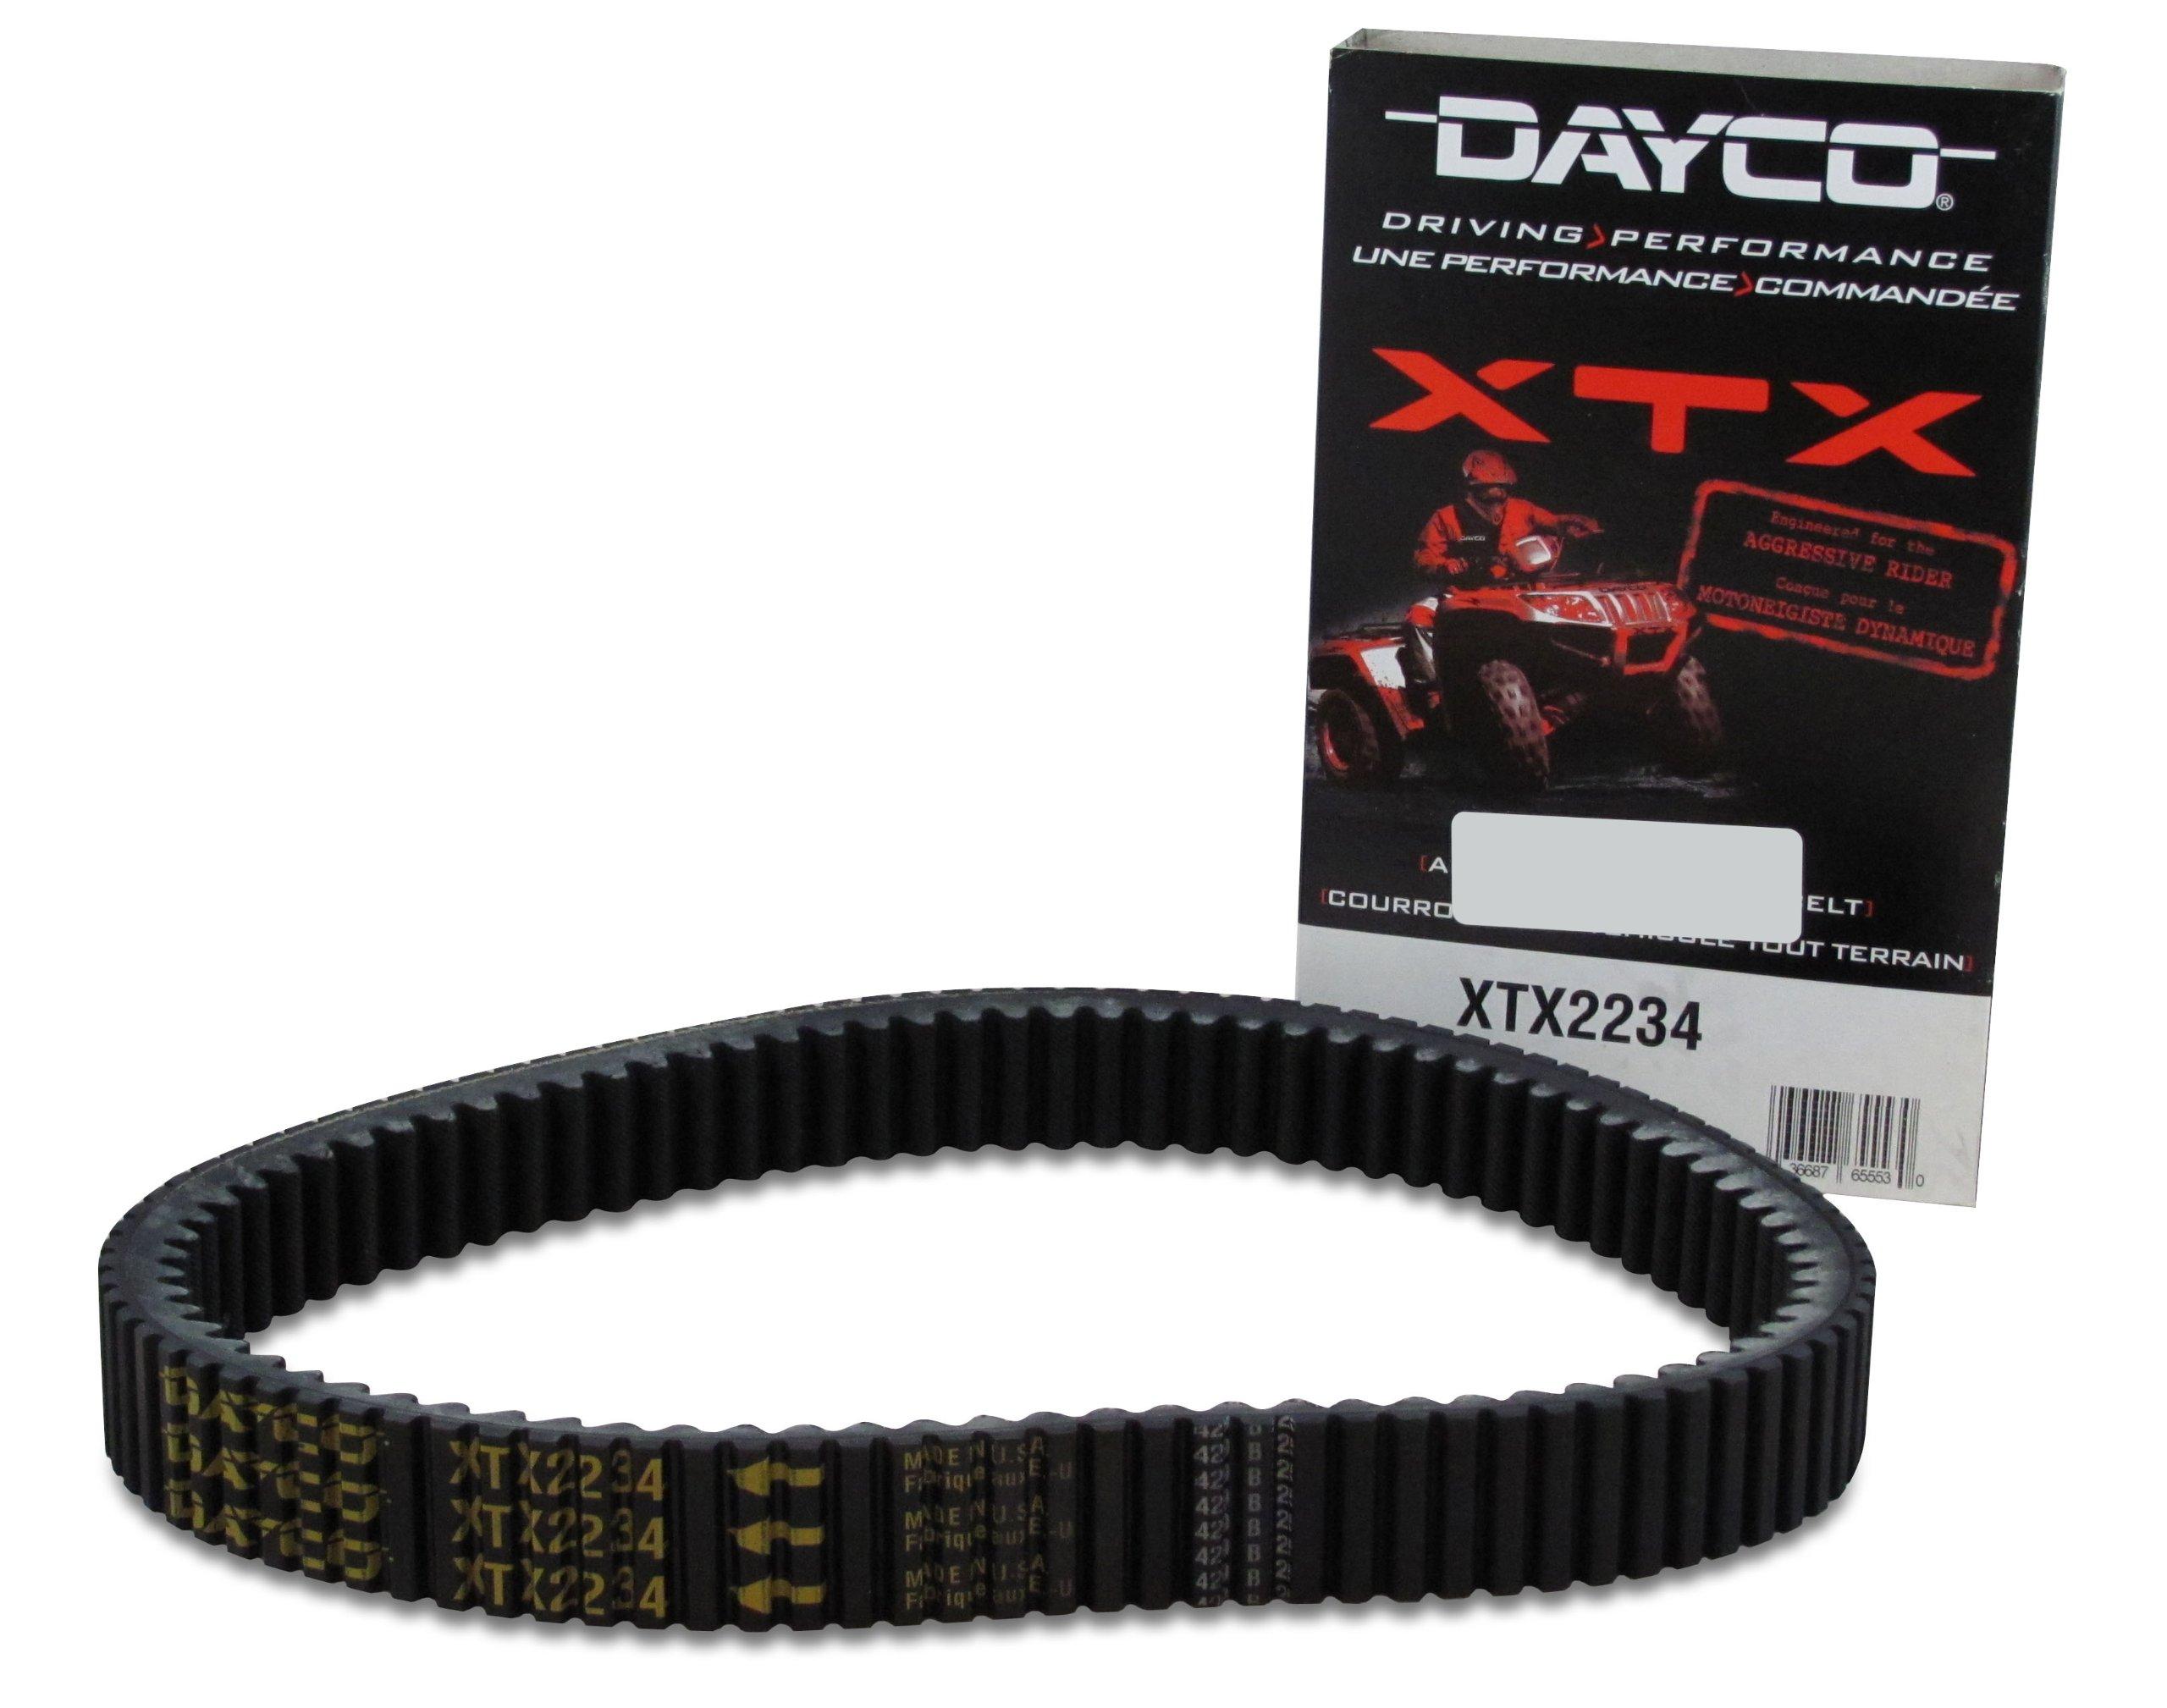 Dayco XTX2234 XTX Extreme Torque ATV/UTV Drive Belt